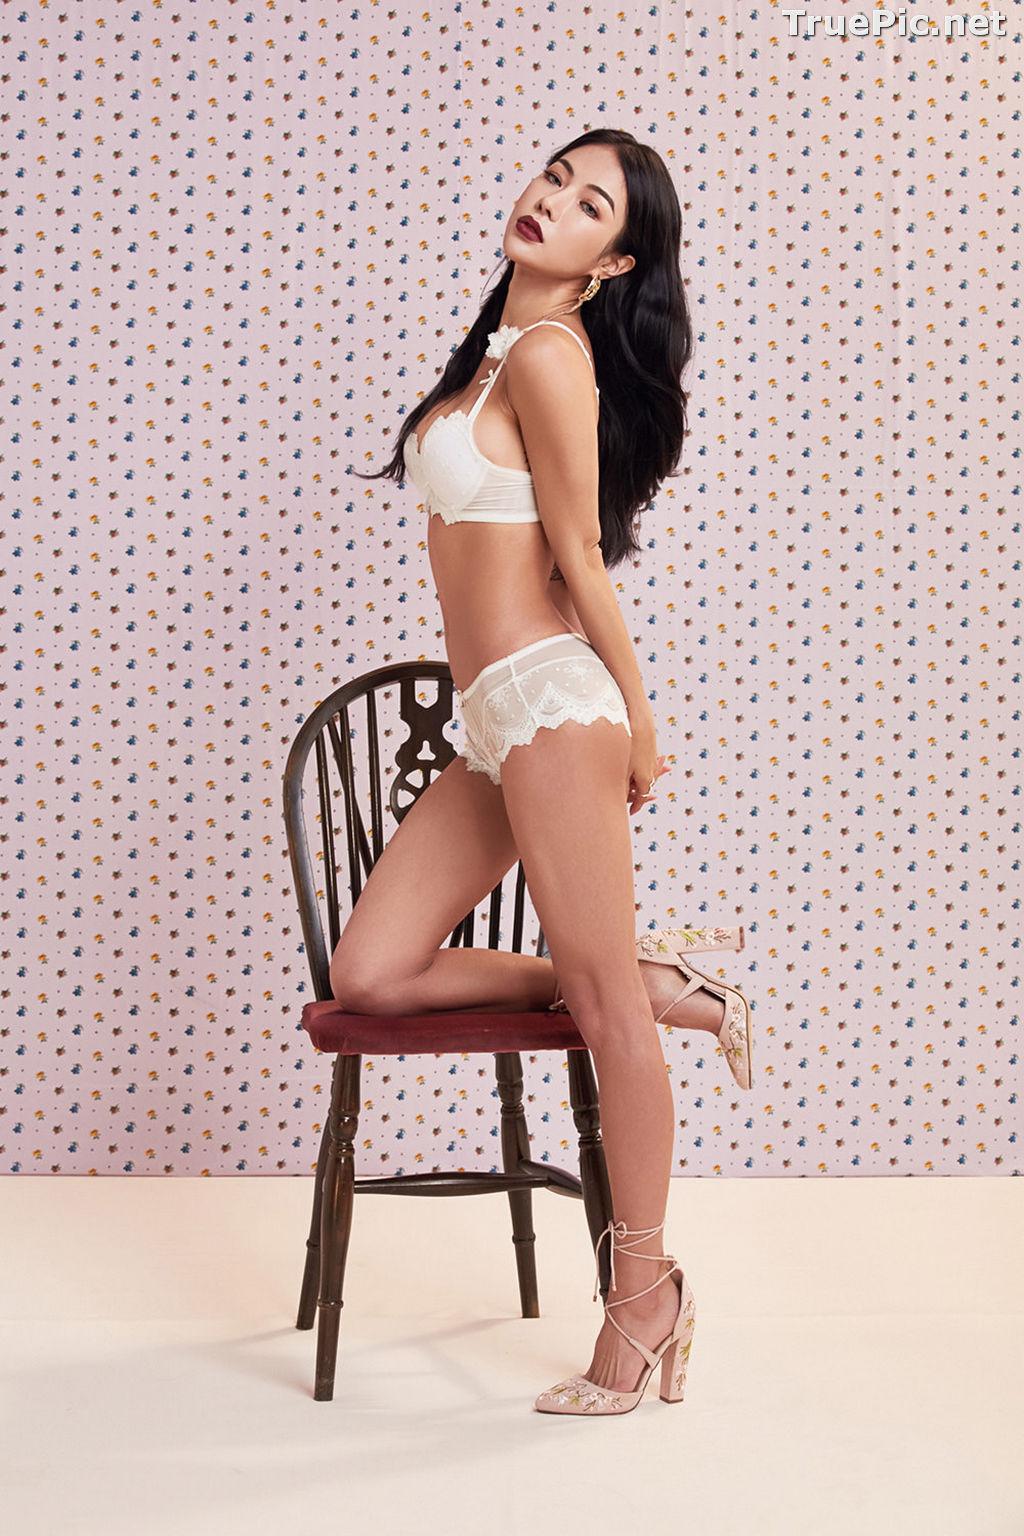 Image Korean Fashion Model - An Seo Rin - White Lingerie and Sleepwear Set - TruePic.net - Picture-9